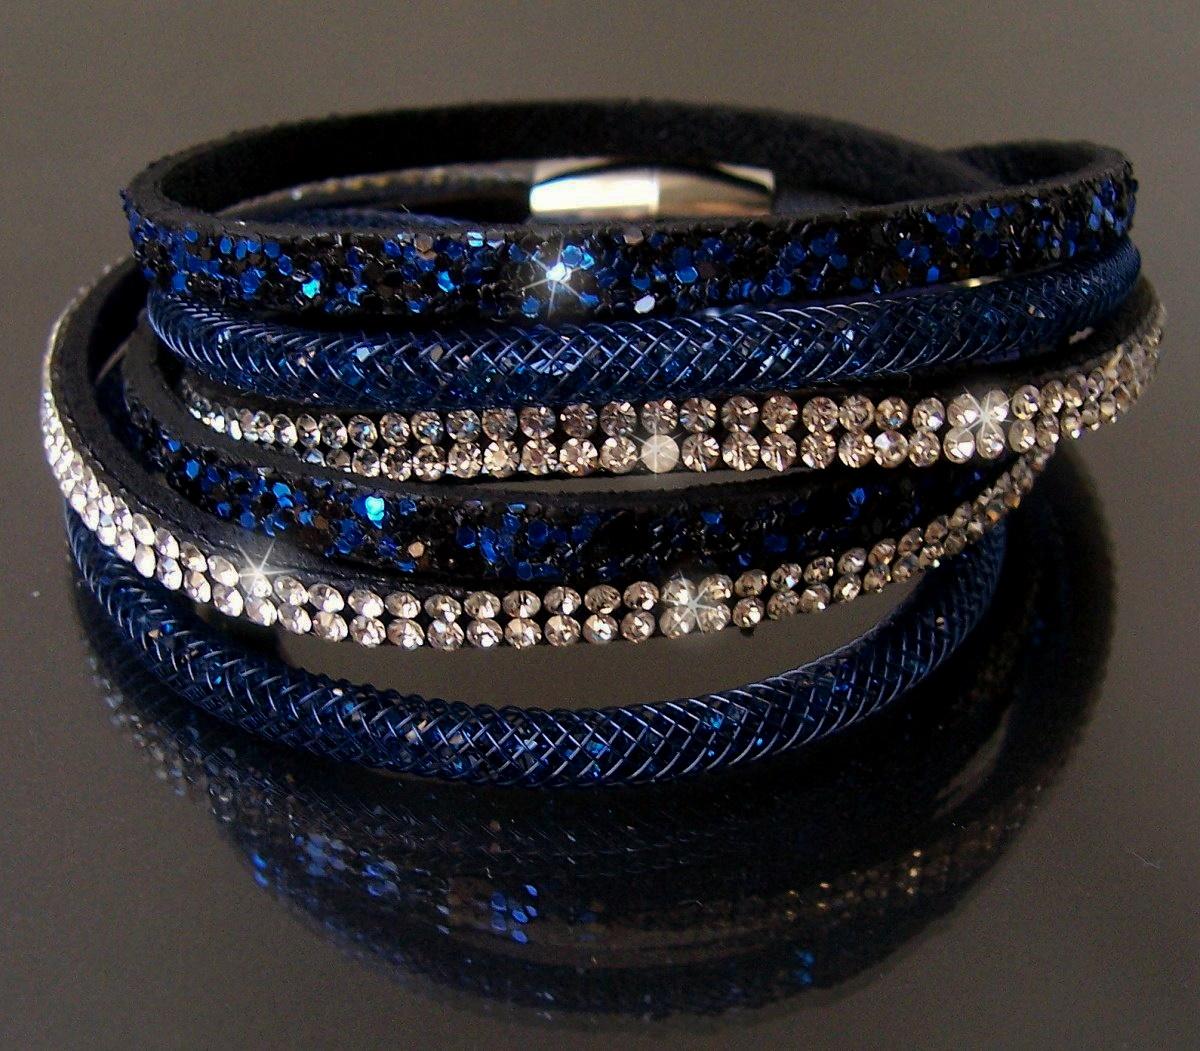 A6033B* 2-fach Wickelarmband Netzschlauch Leder Glitzer Strass blau